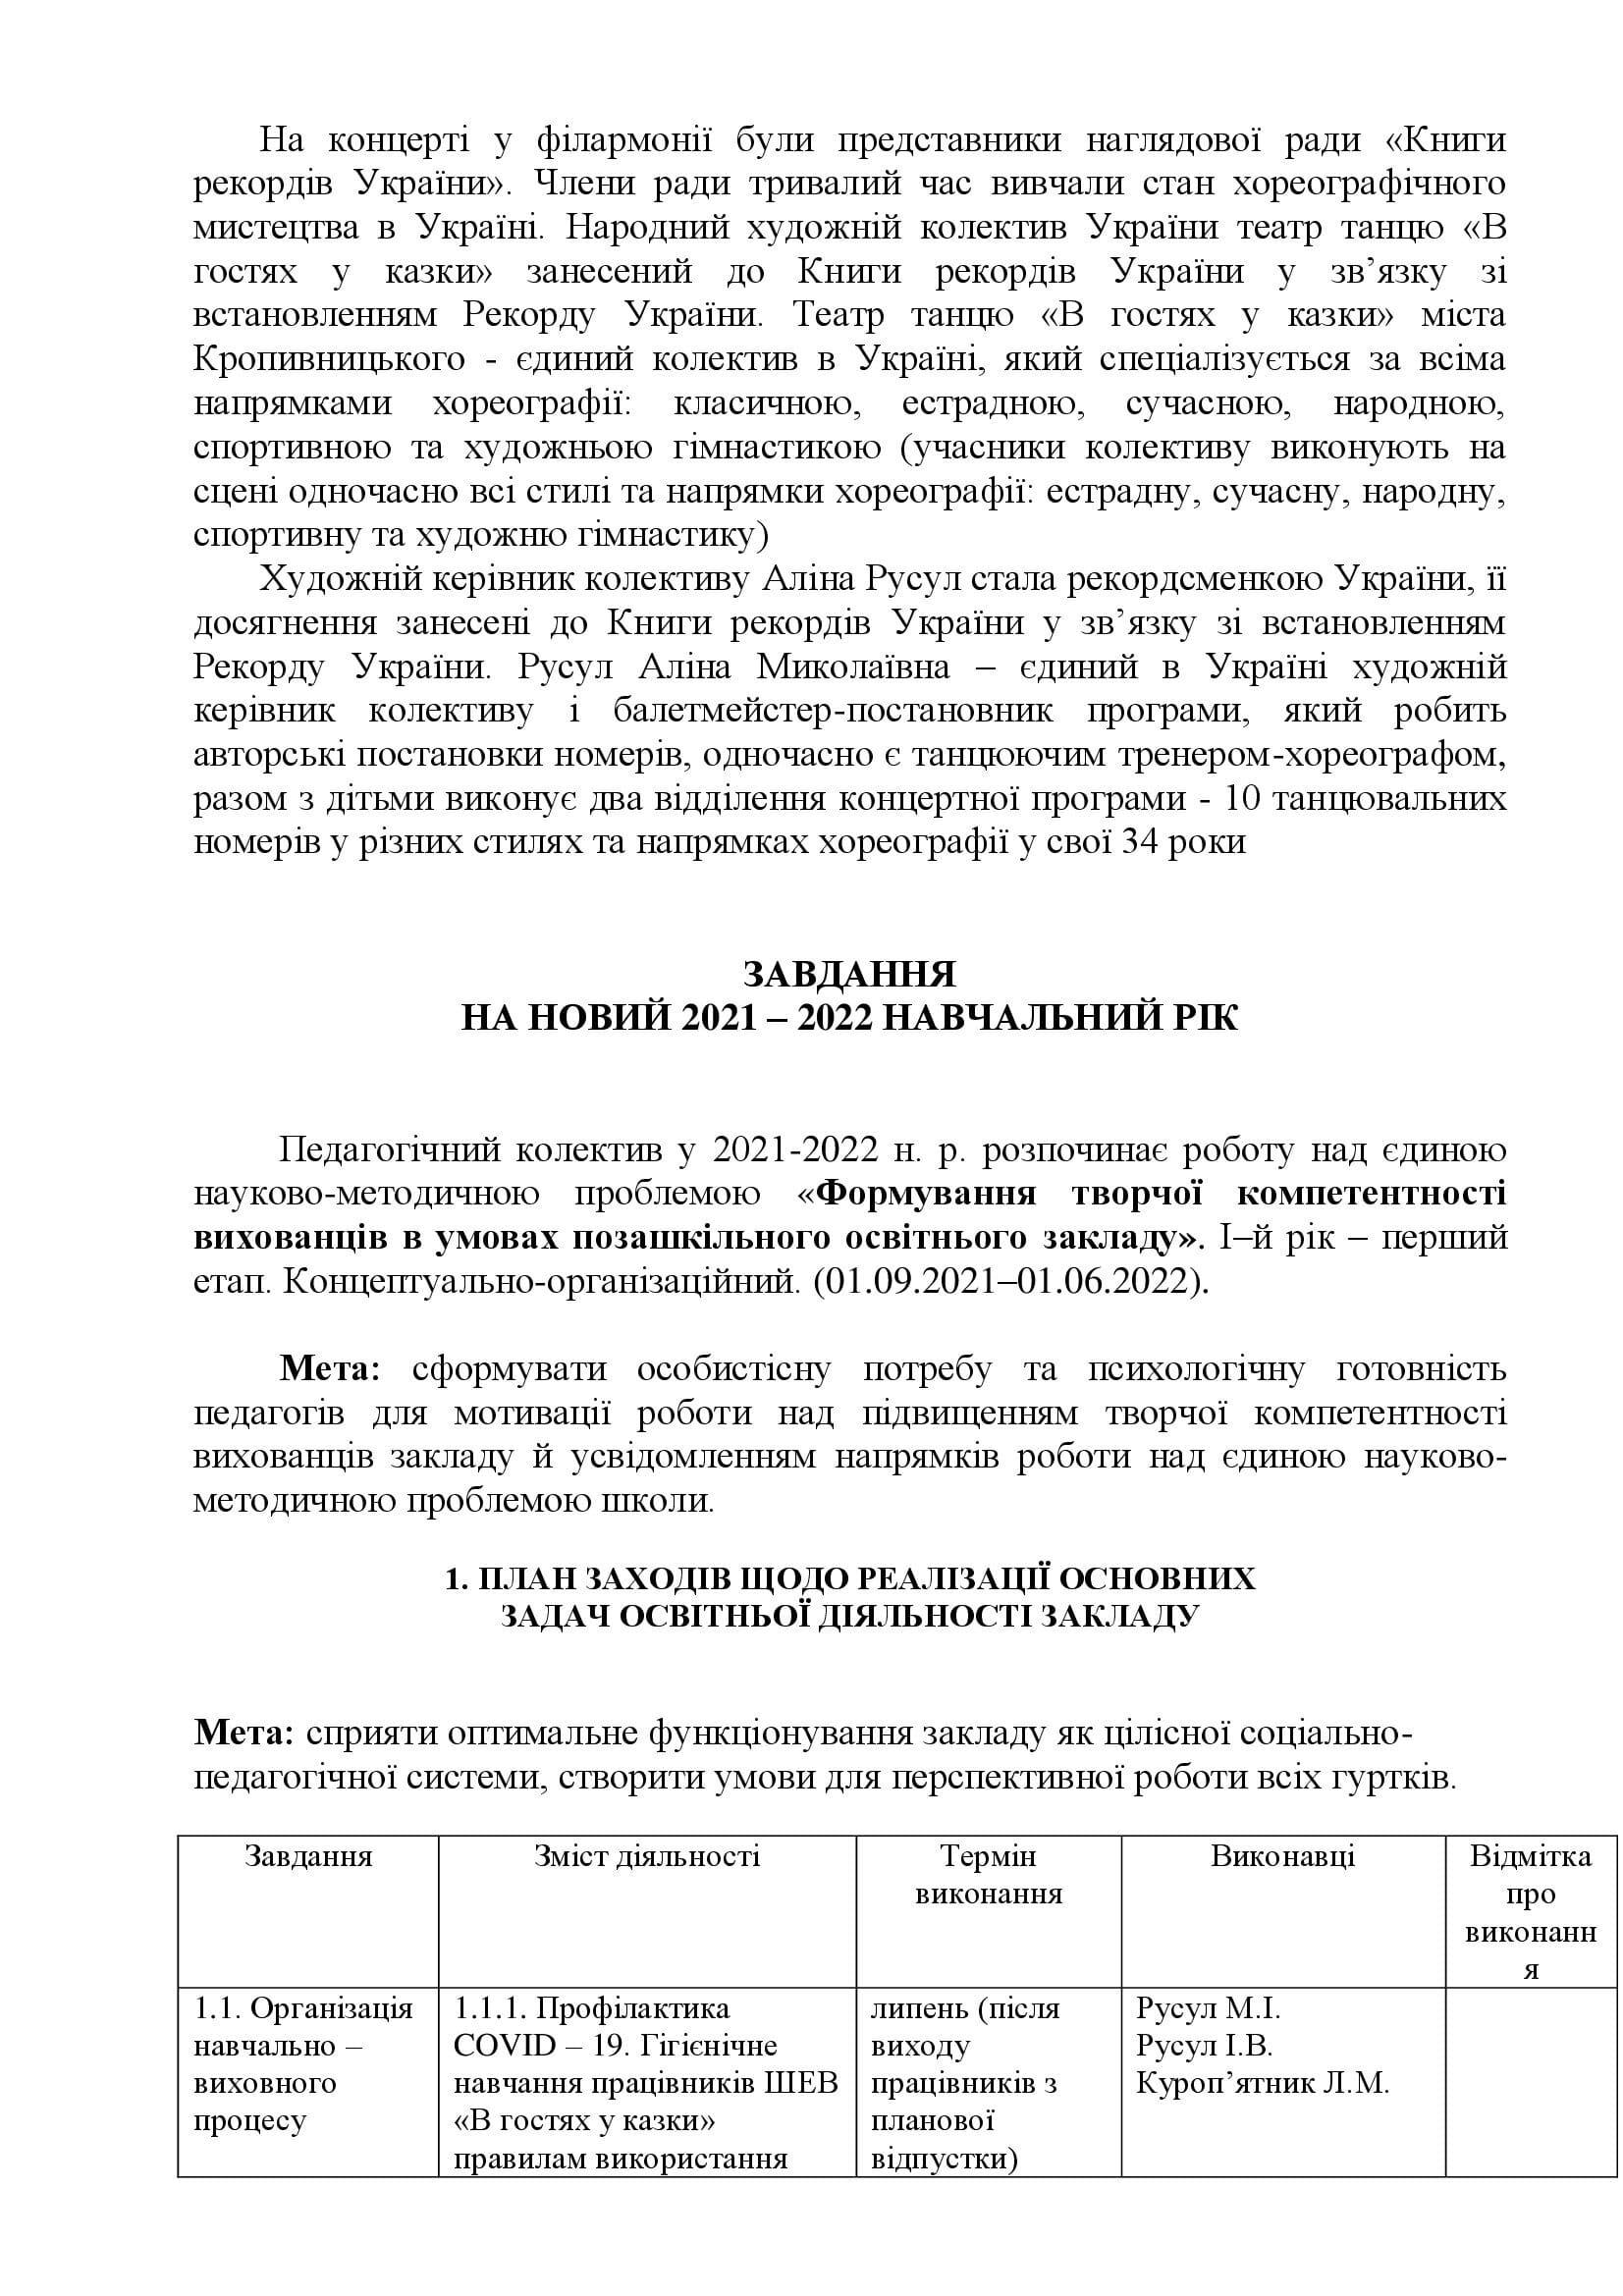 План роботи ШЕВ В гостях у казки  2021-2022_00011